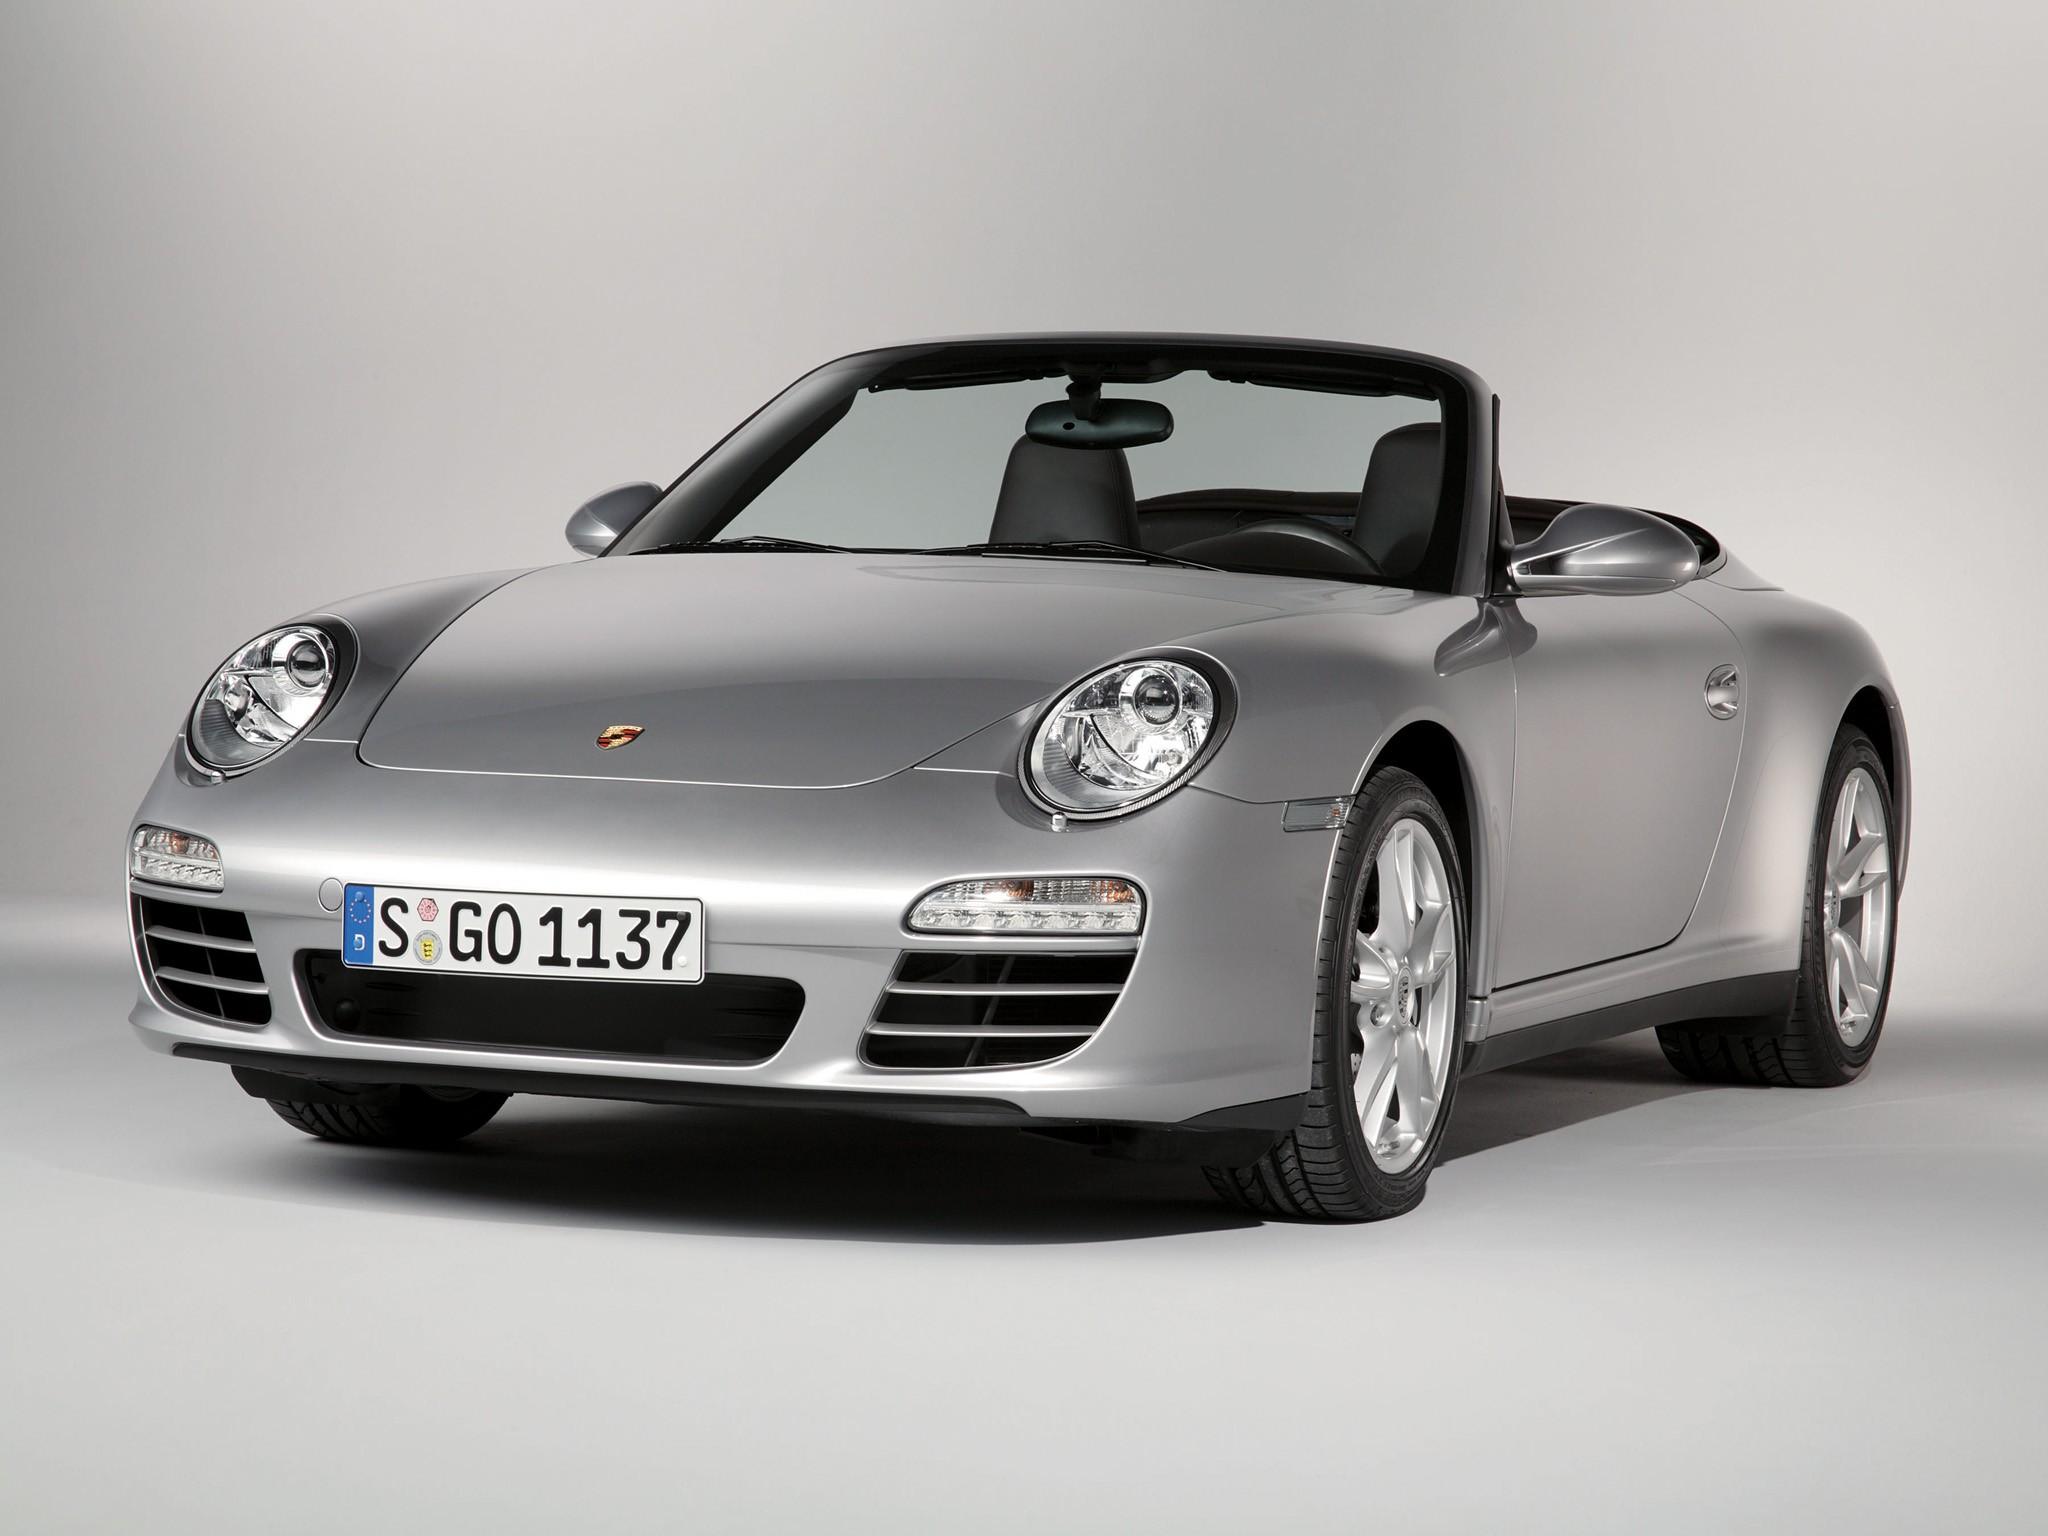 porsche 911 carrera 4 cabriolet 997 specs 2008 2009 2010 2011 autoevolution. Black Bedroom Furniture Sets. Home Design Ideas